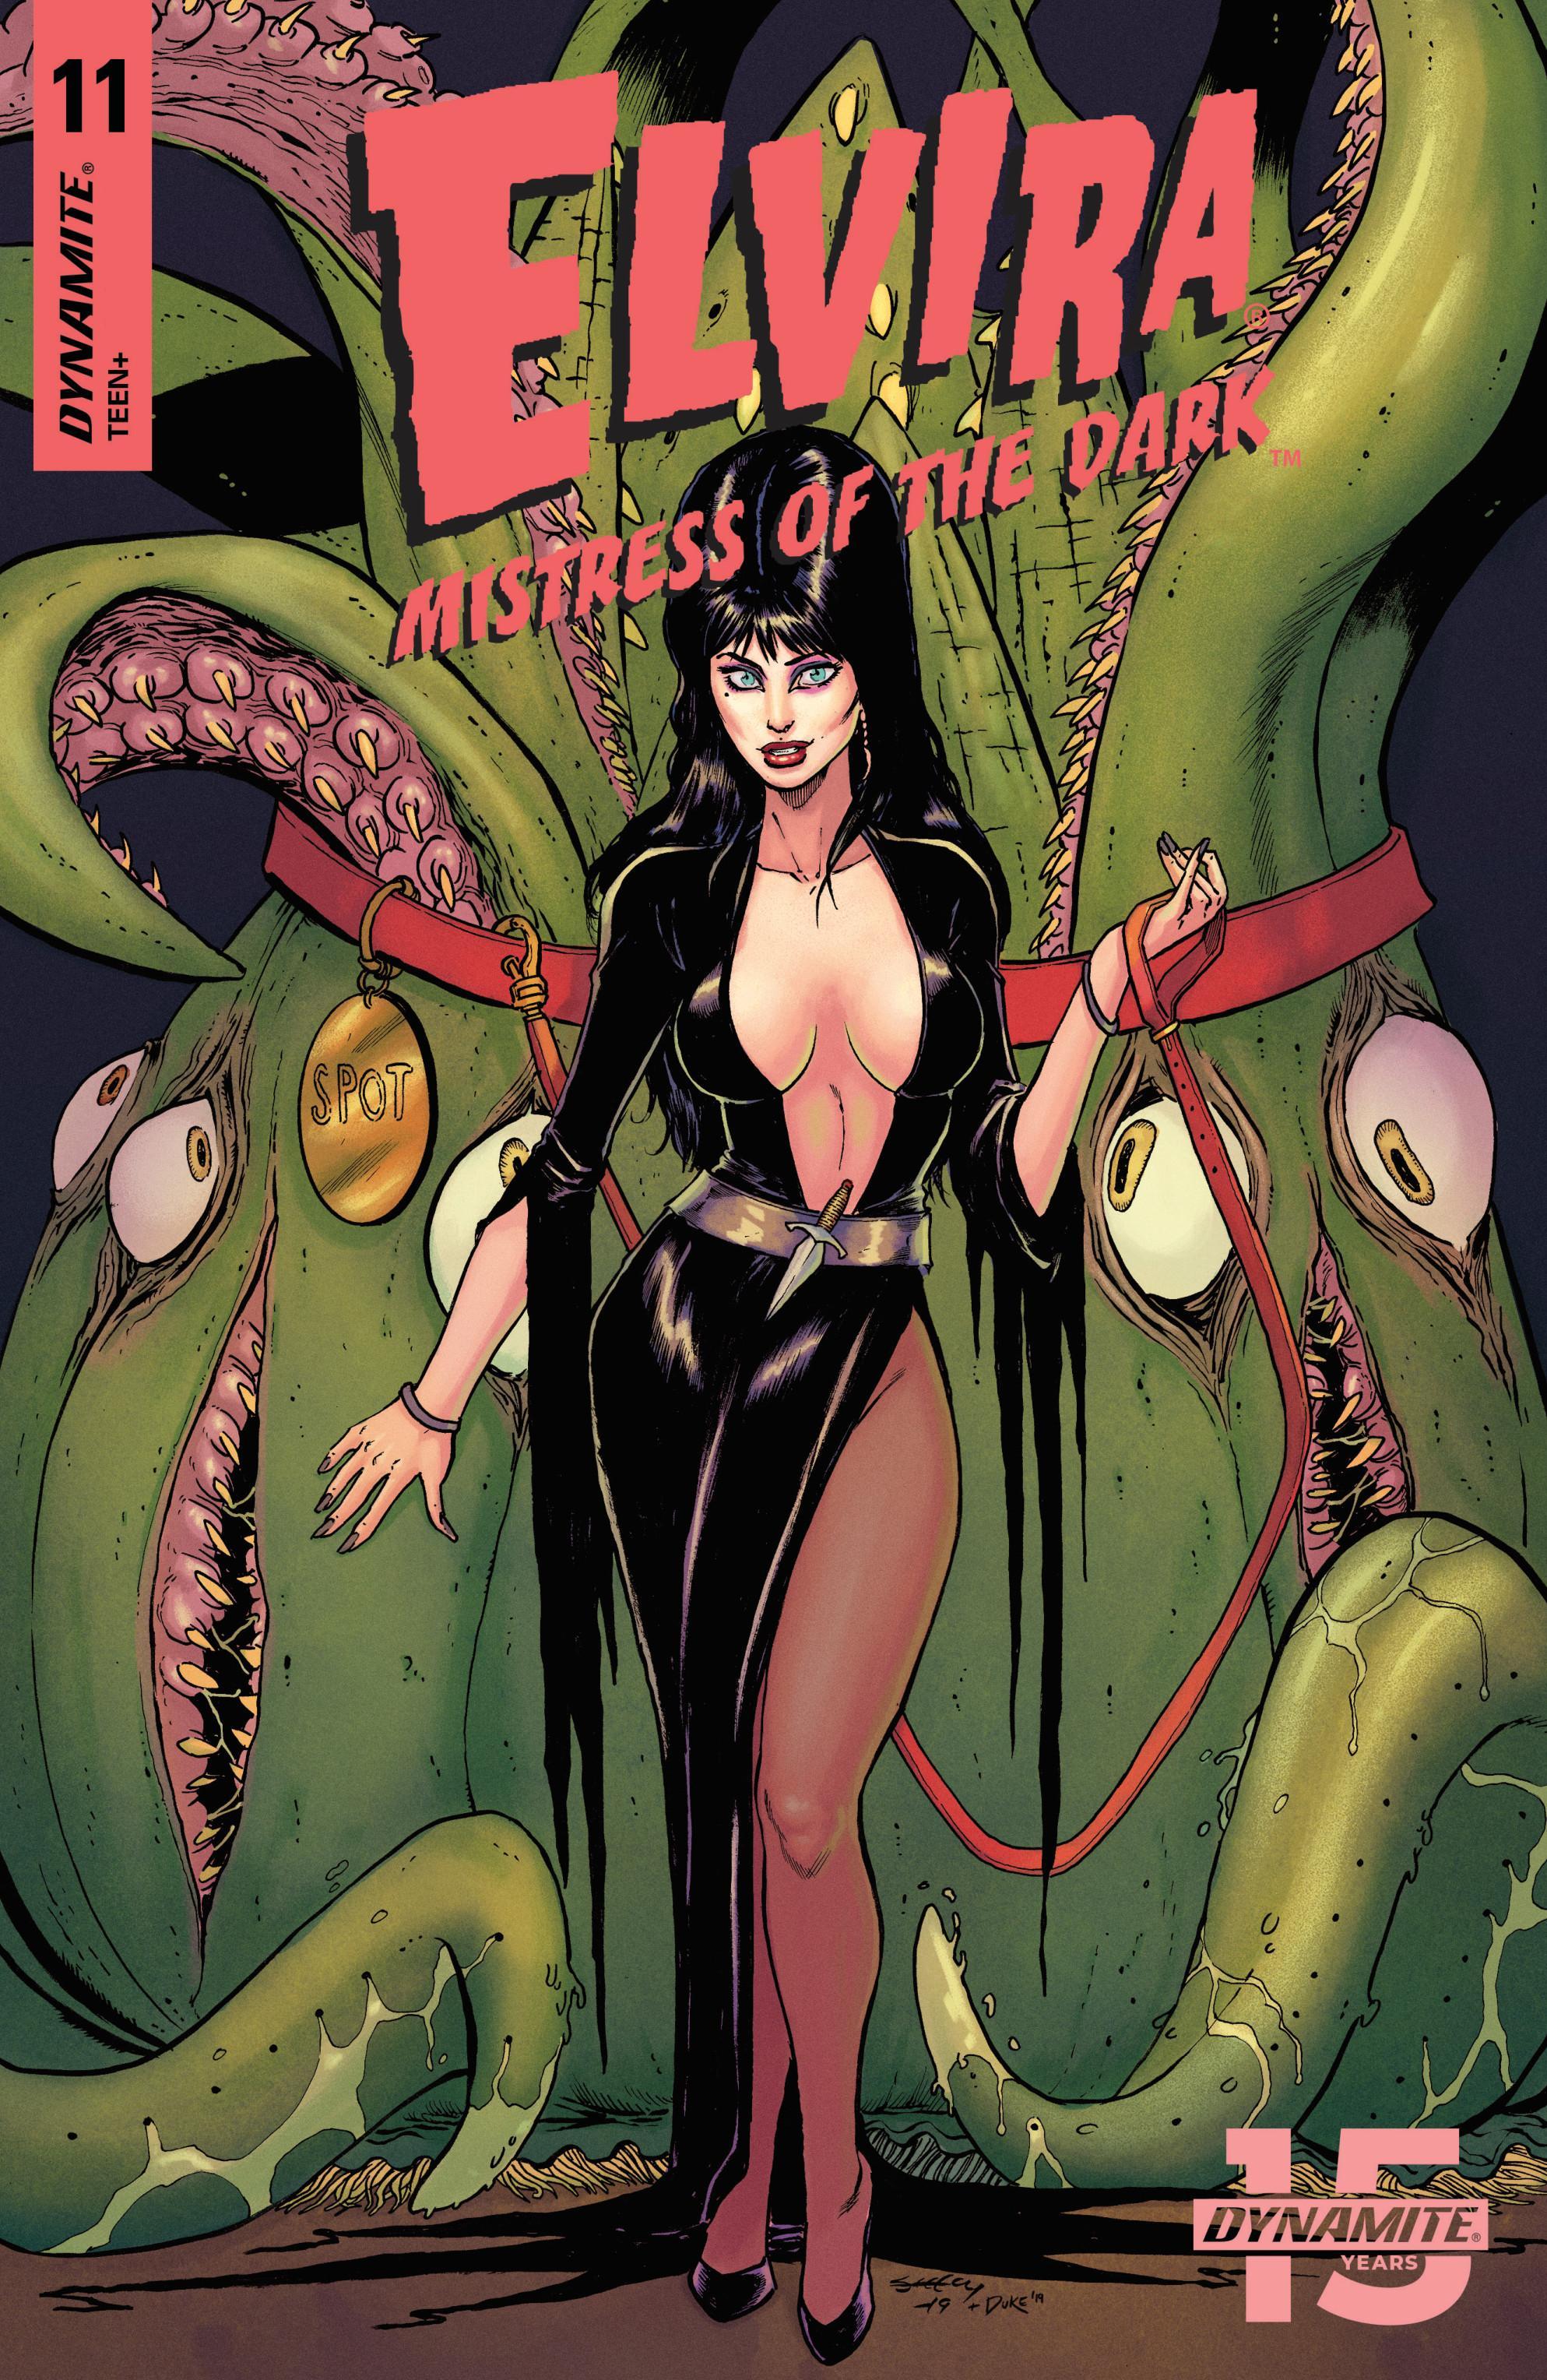 Elvira-Mistress of the Dark 011 2020 4 covers digital Son of Ultron